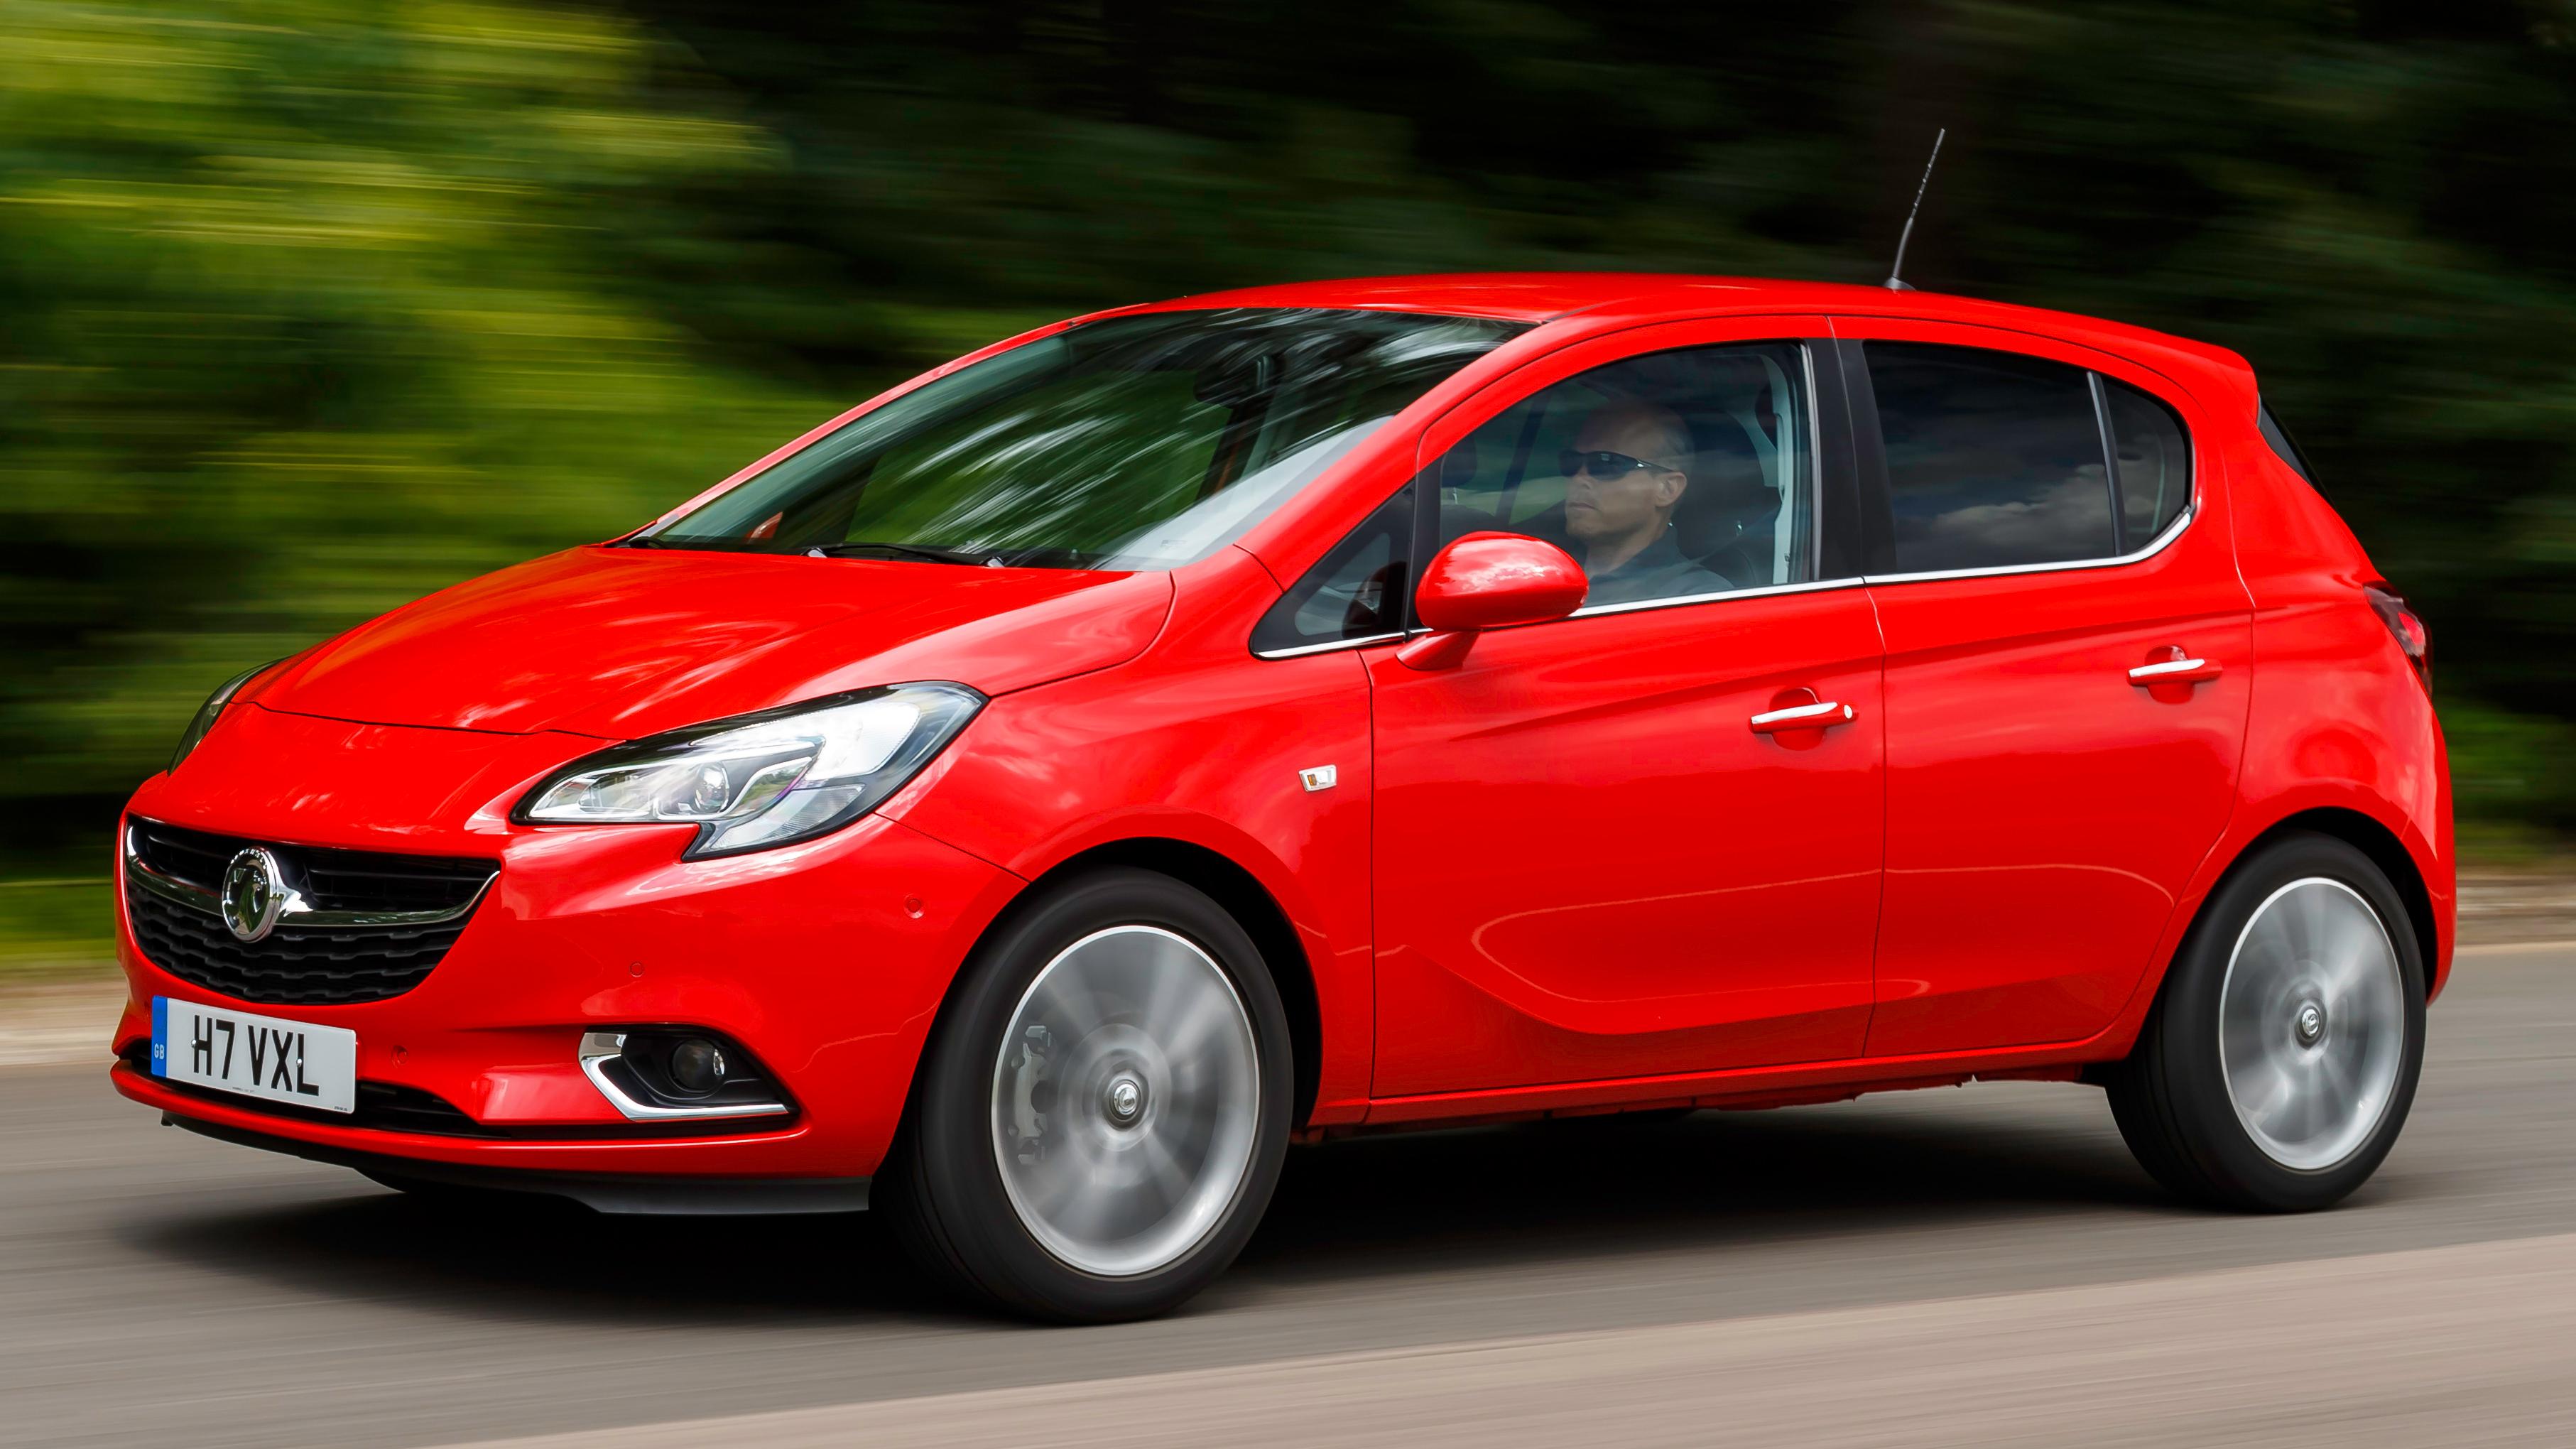 Vauxhall/Opel Corsa – fourth-gen supermini unveiled Image 257658